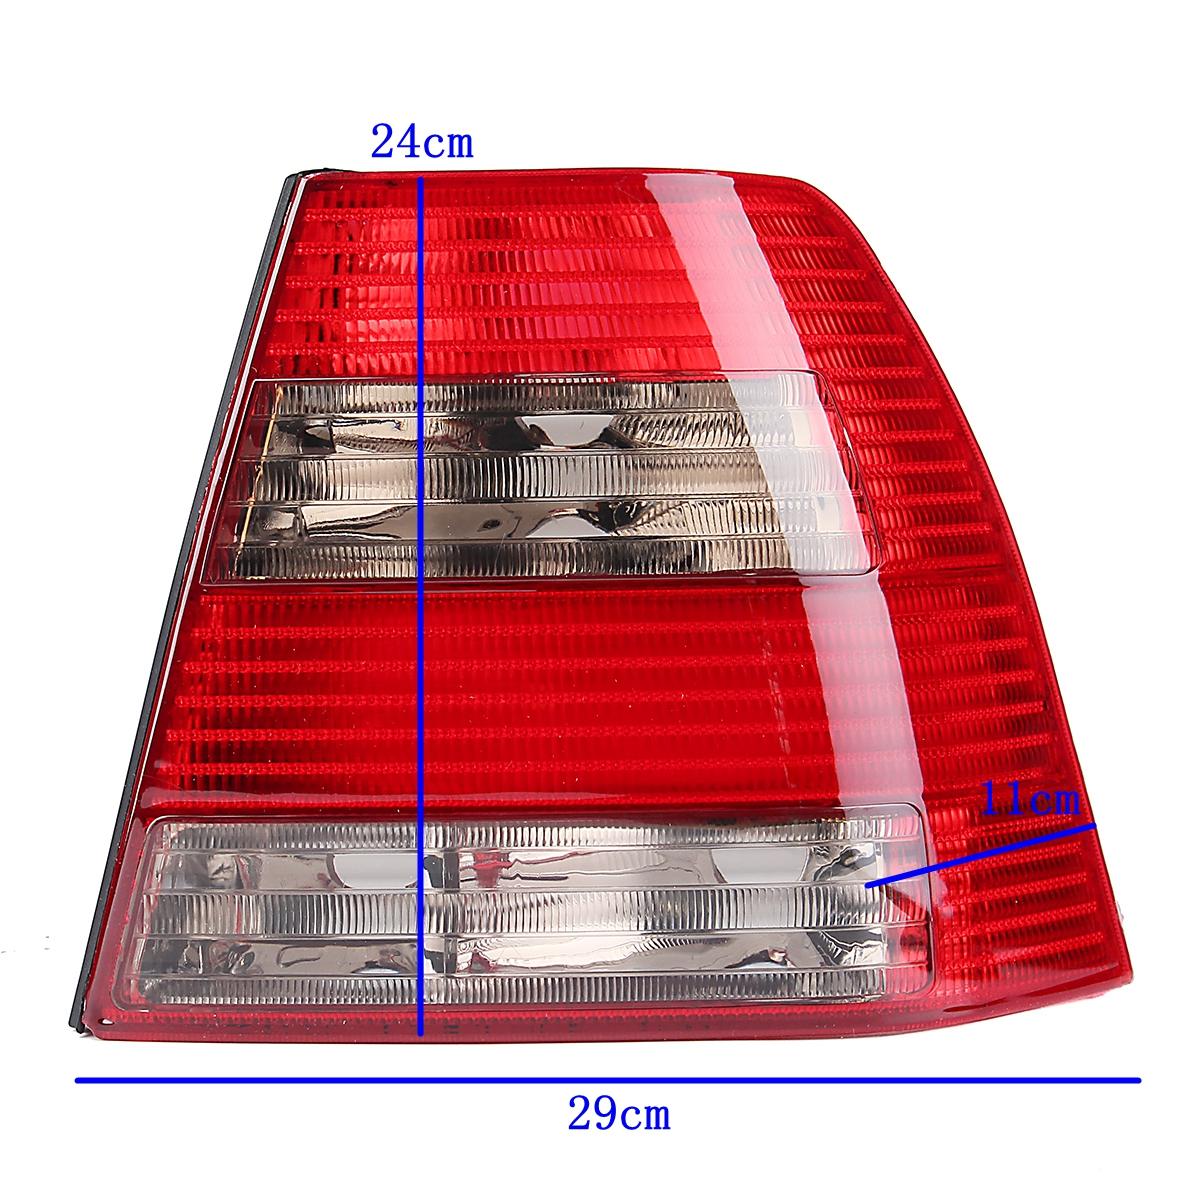 Пара Авто Задний фонарь Тормозная лампа Лампа Красный 401341673737 для VW Jetta / Bora MK4 Седан - фото 2